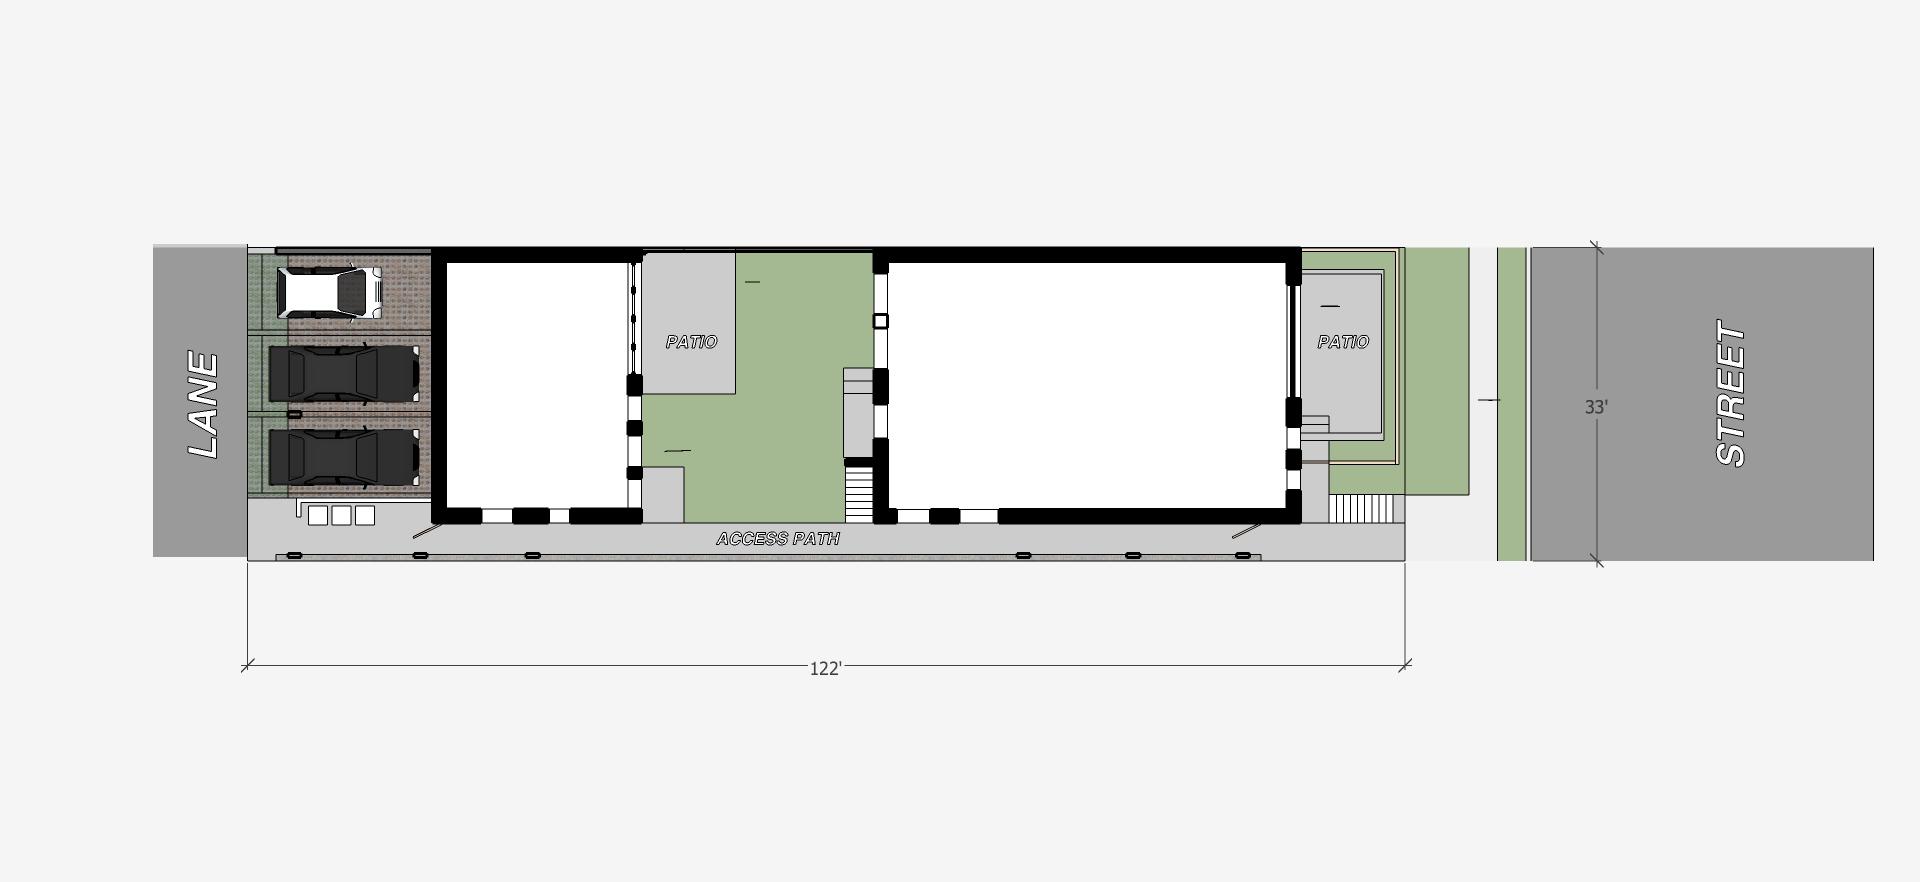 33x122 rowhouse 4 plex - plan